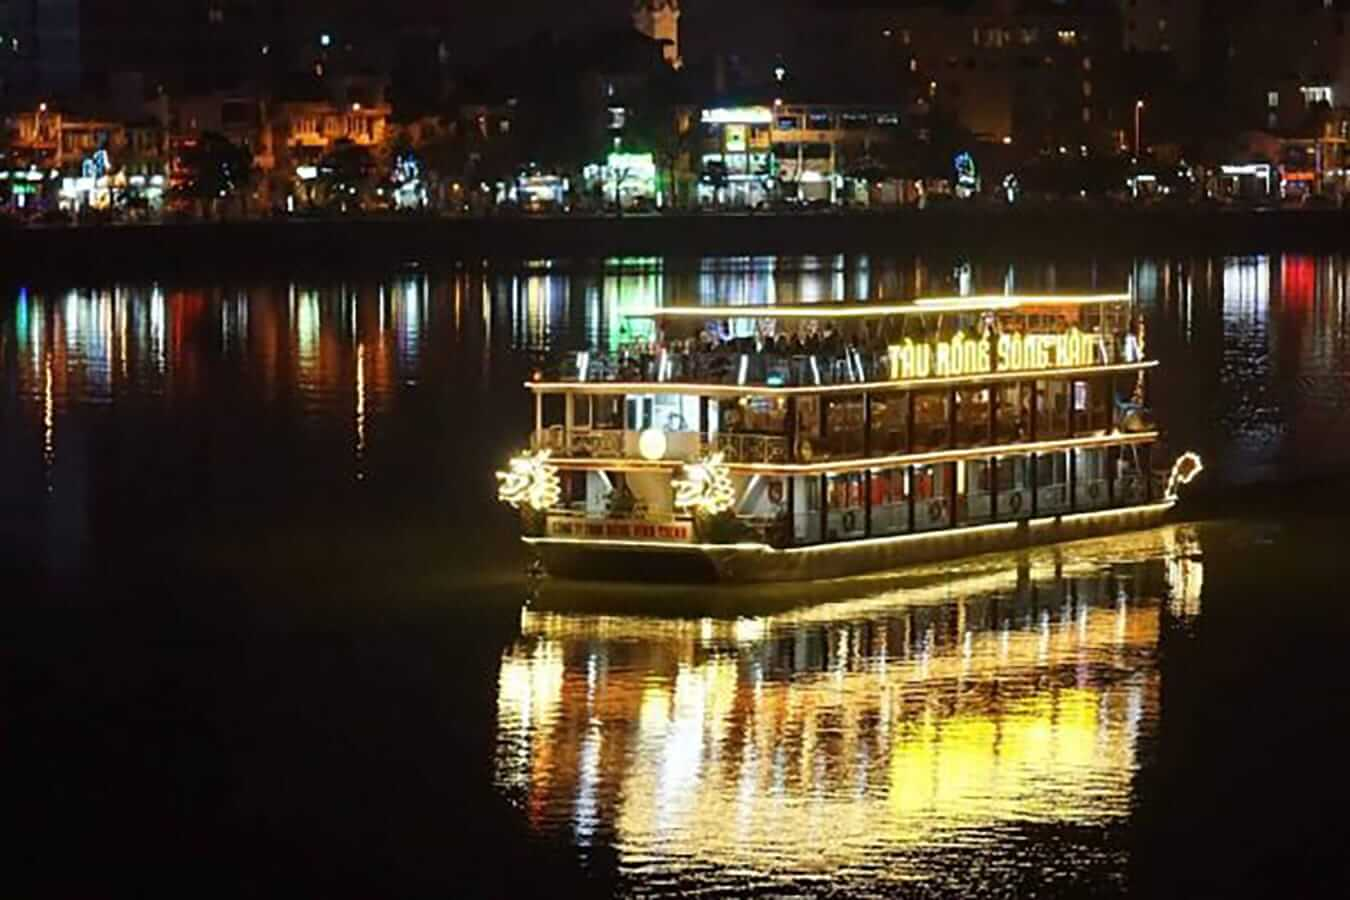 Da Nang's neon riverboats